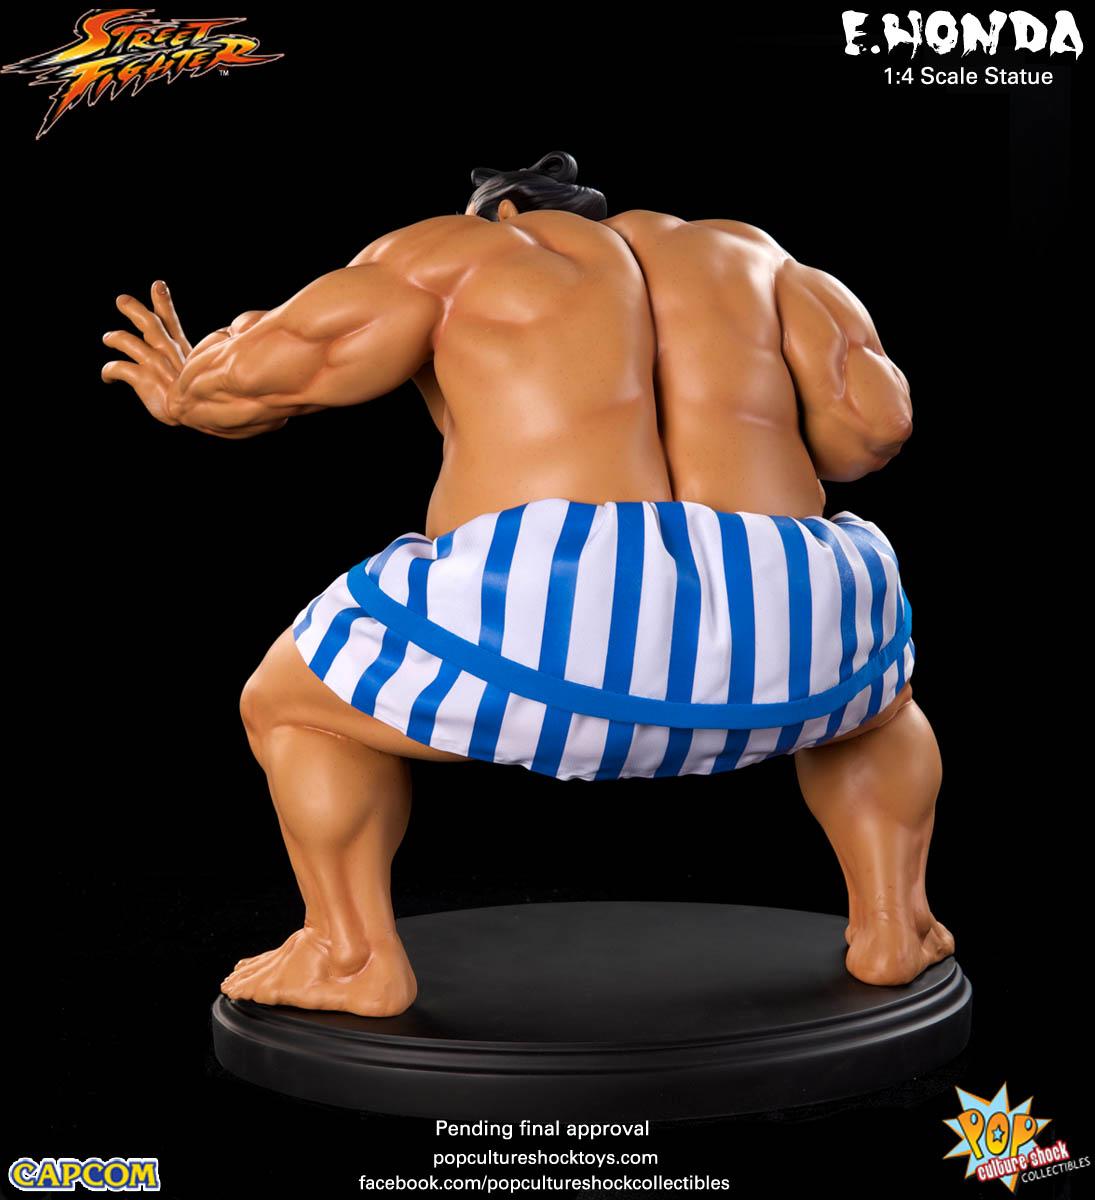 [Pop Culture Shock] Street Fighter: E. Honda 1/4 Statue - Página 3 Street-Fighter-E.-Honda-Regular-Statue-006